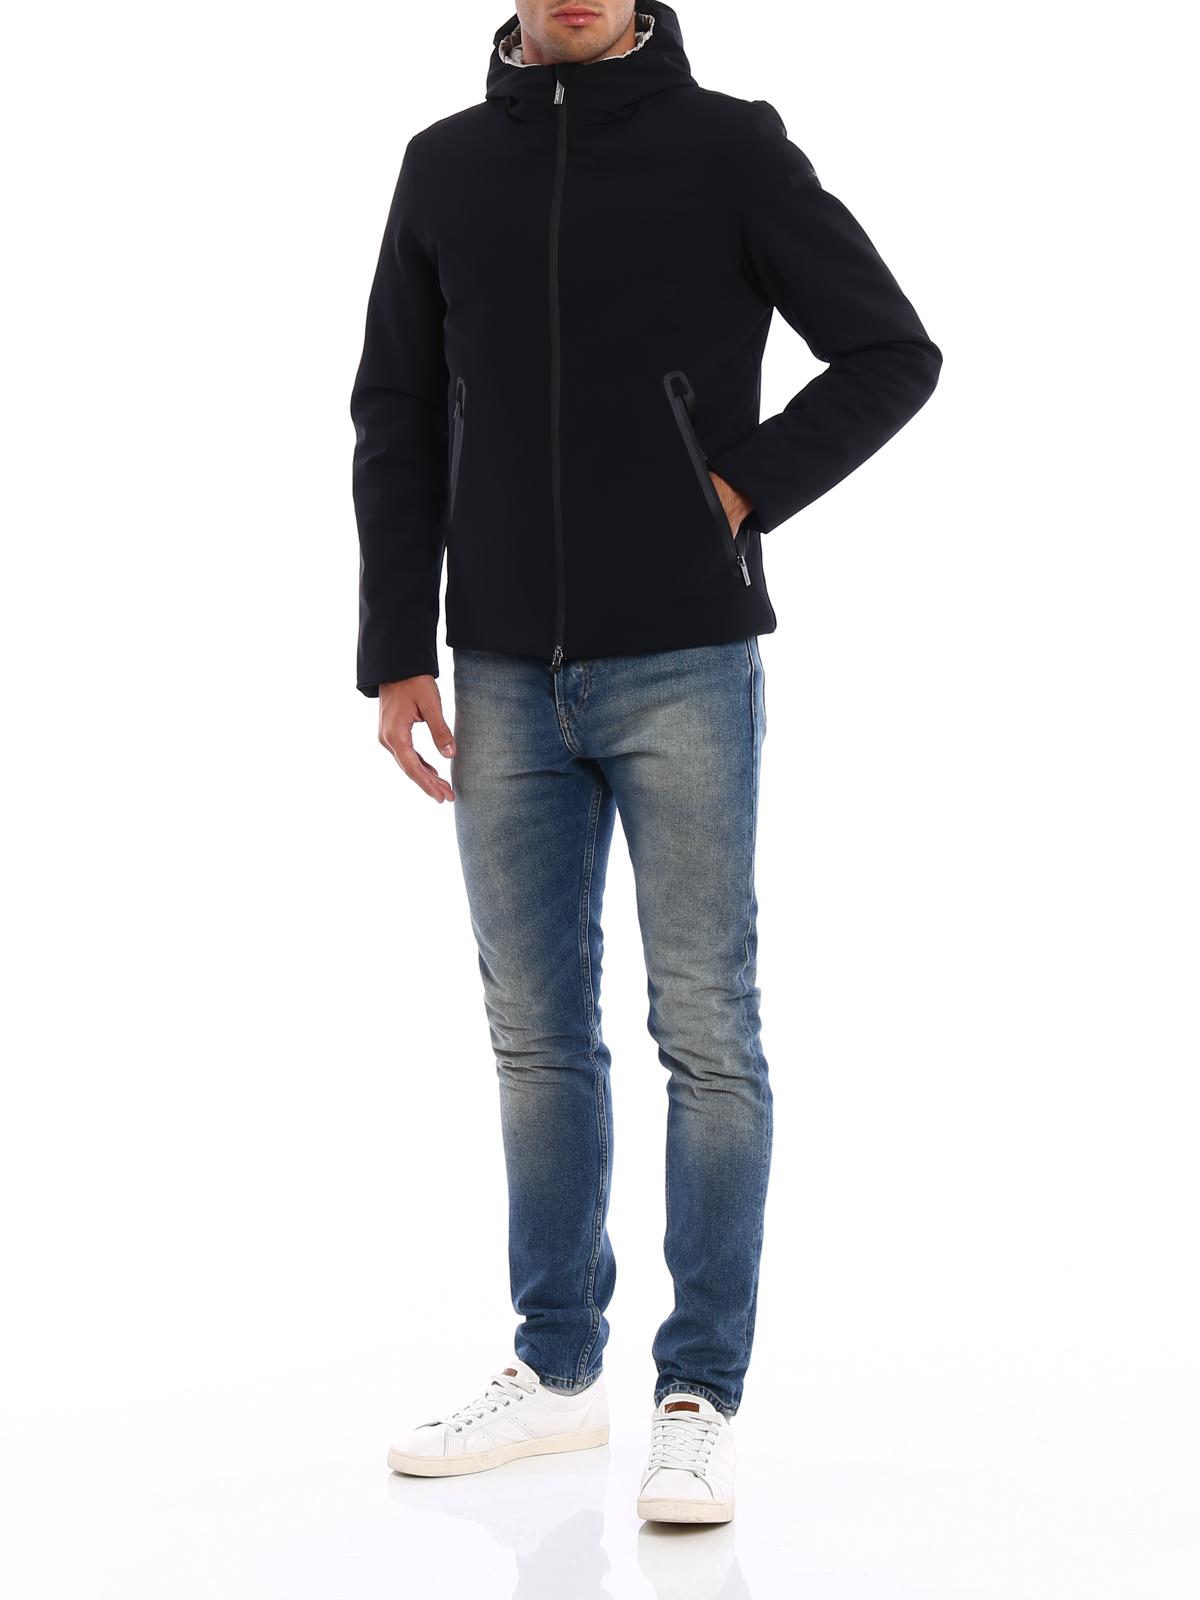 imbottite 12 Storm Winter 10 Giacca giacche W17001 RRD imbottita xqv6n8wX